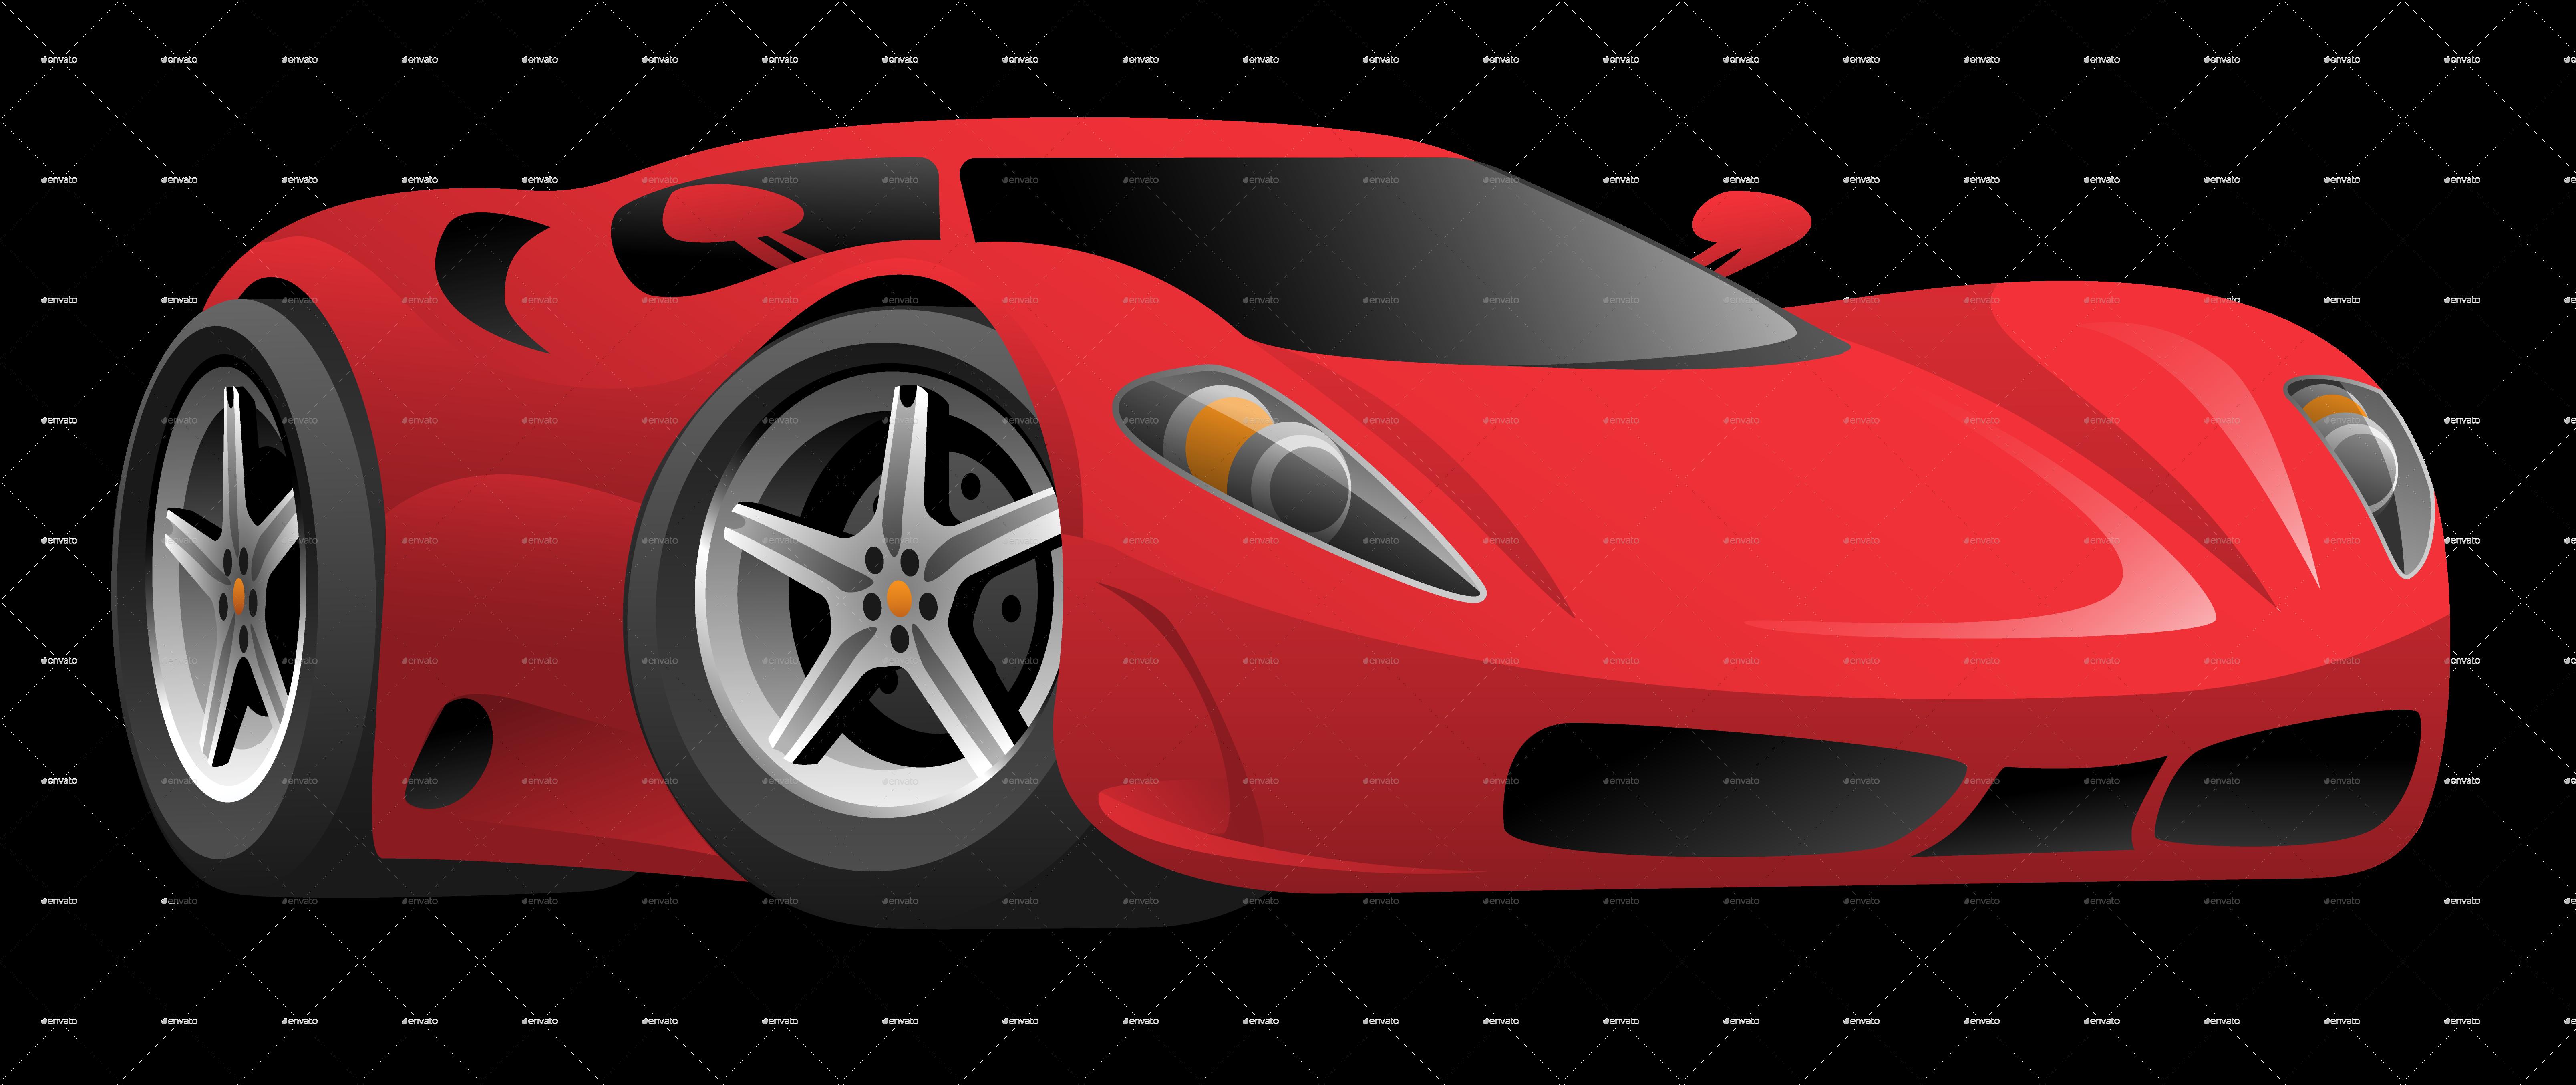 Fancy Car Logos >> Red Hot European Style Sports Car Cartoon by jeffhobrath   GraphicRiver